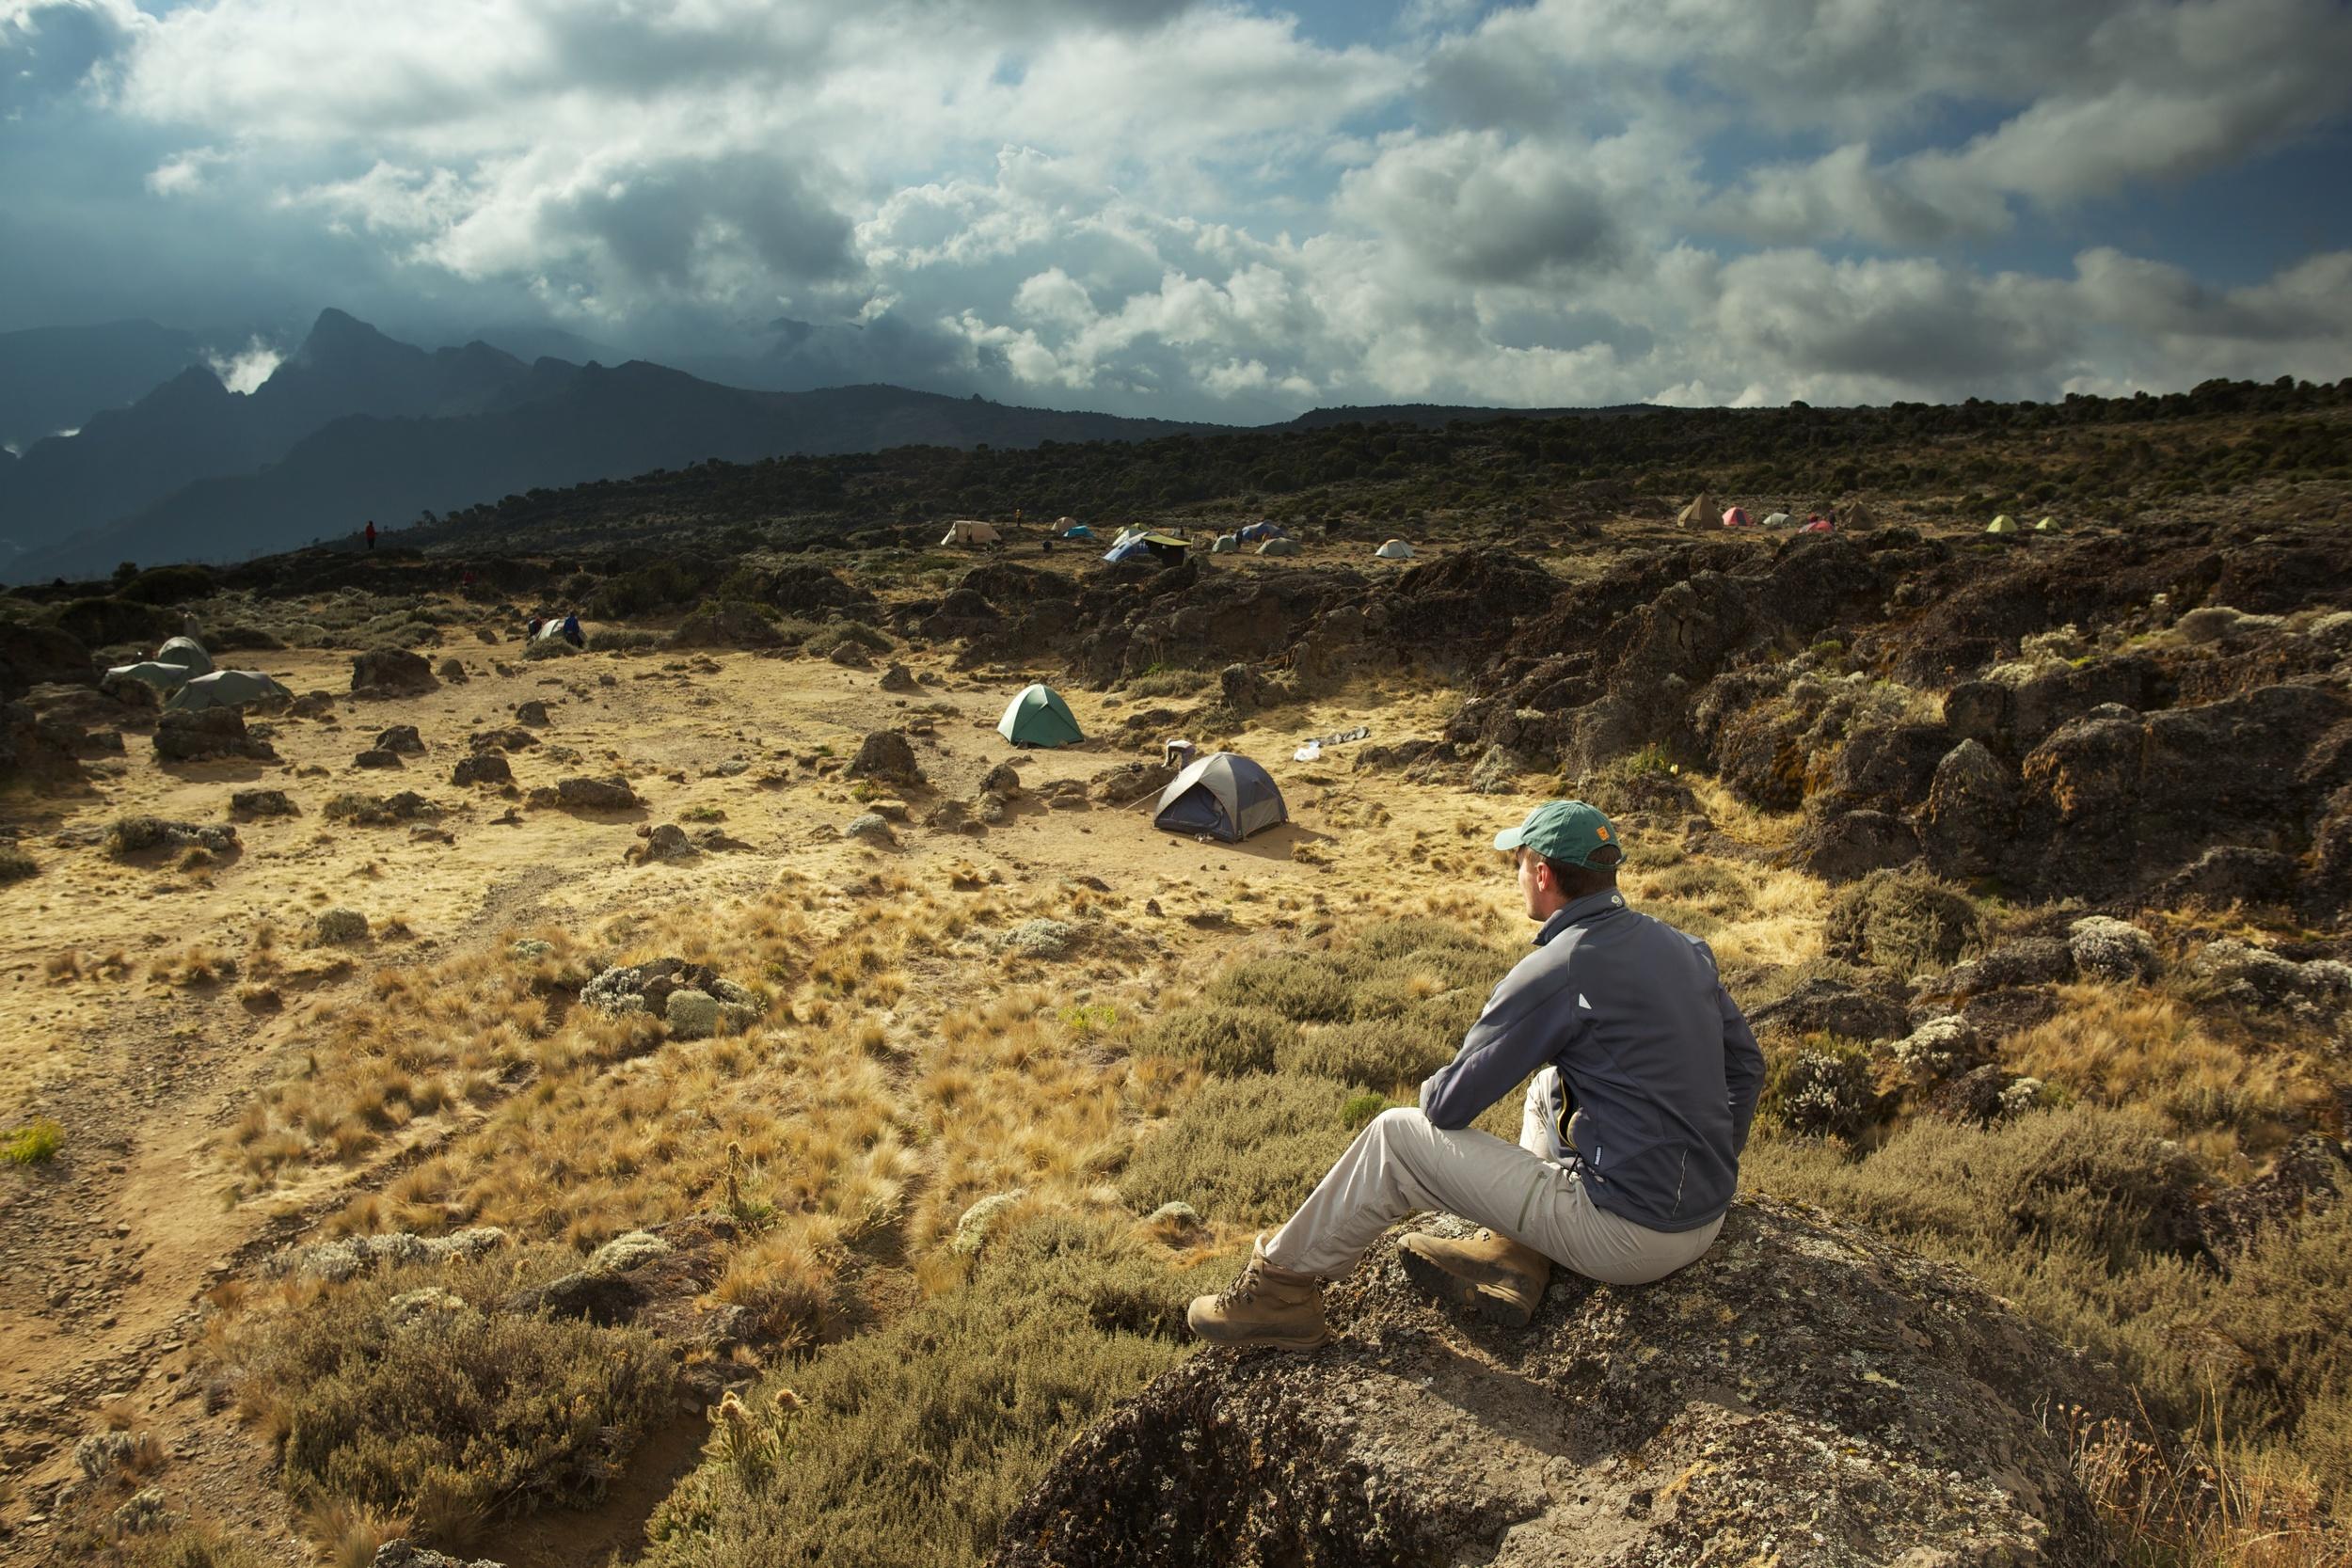 Georgi @ Shira Camp, 3940asml, Kilimanjaro (TZ), Sep 2012